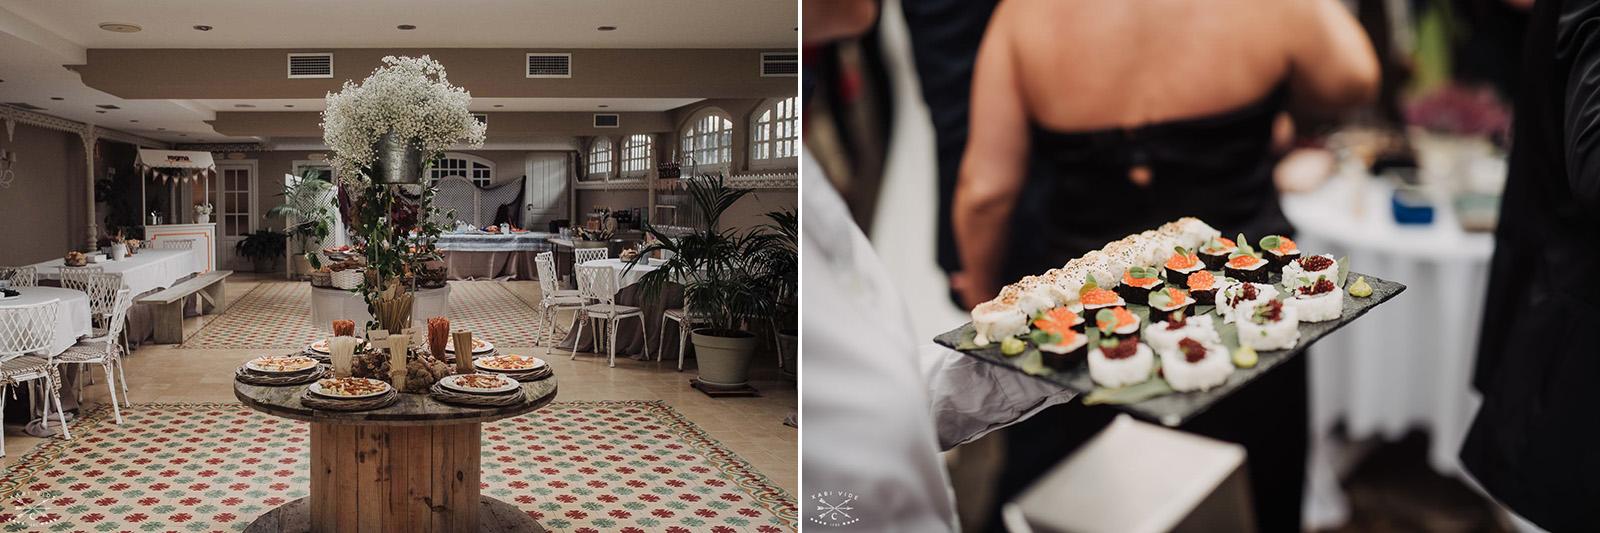 boda en la hosteria de arnuero-150